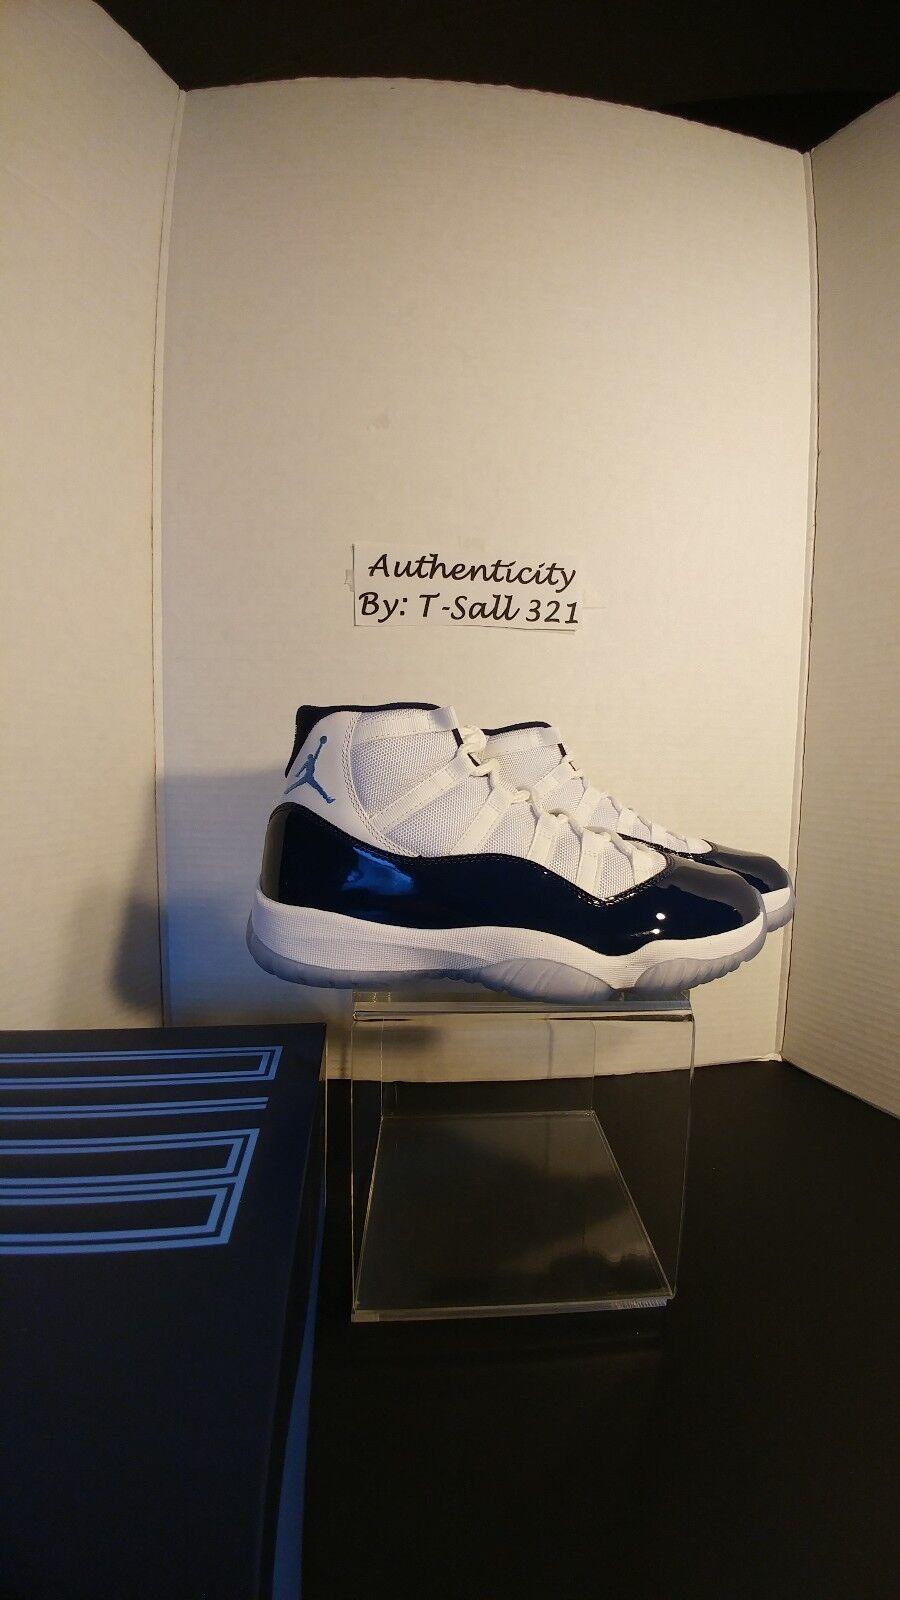 DS Air Jordan 11 Retro  Win like 82  US men's size 10